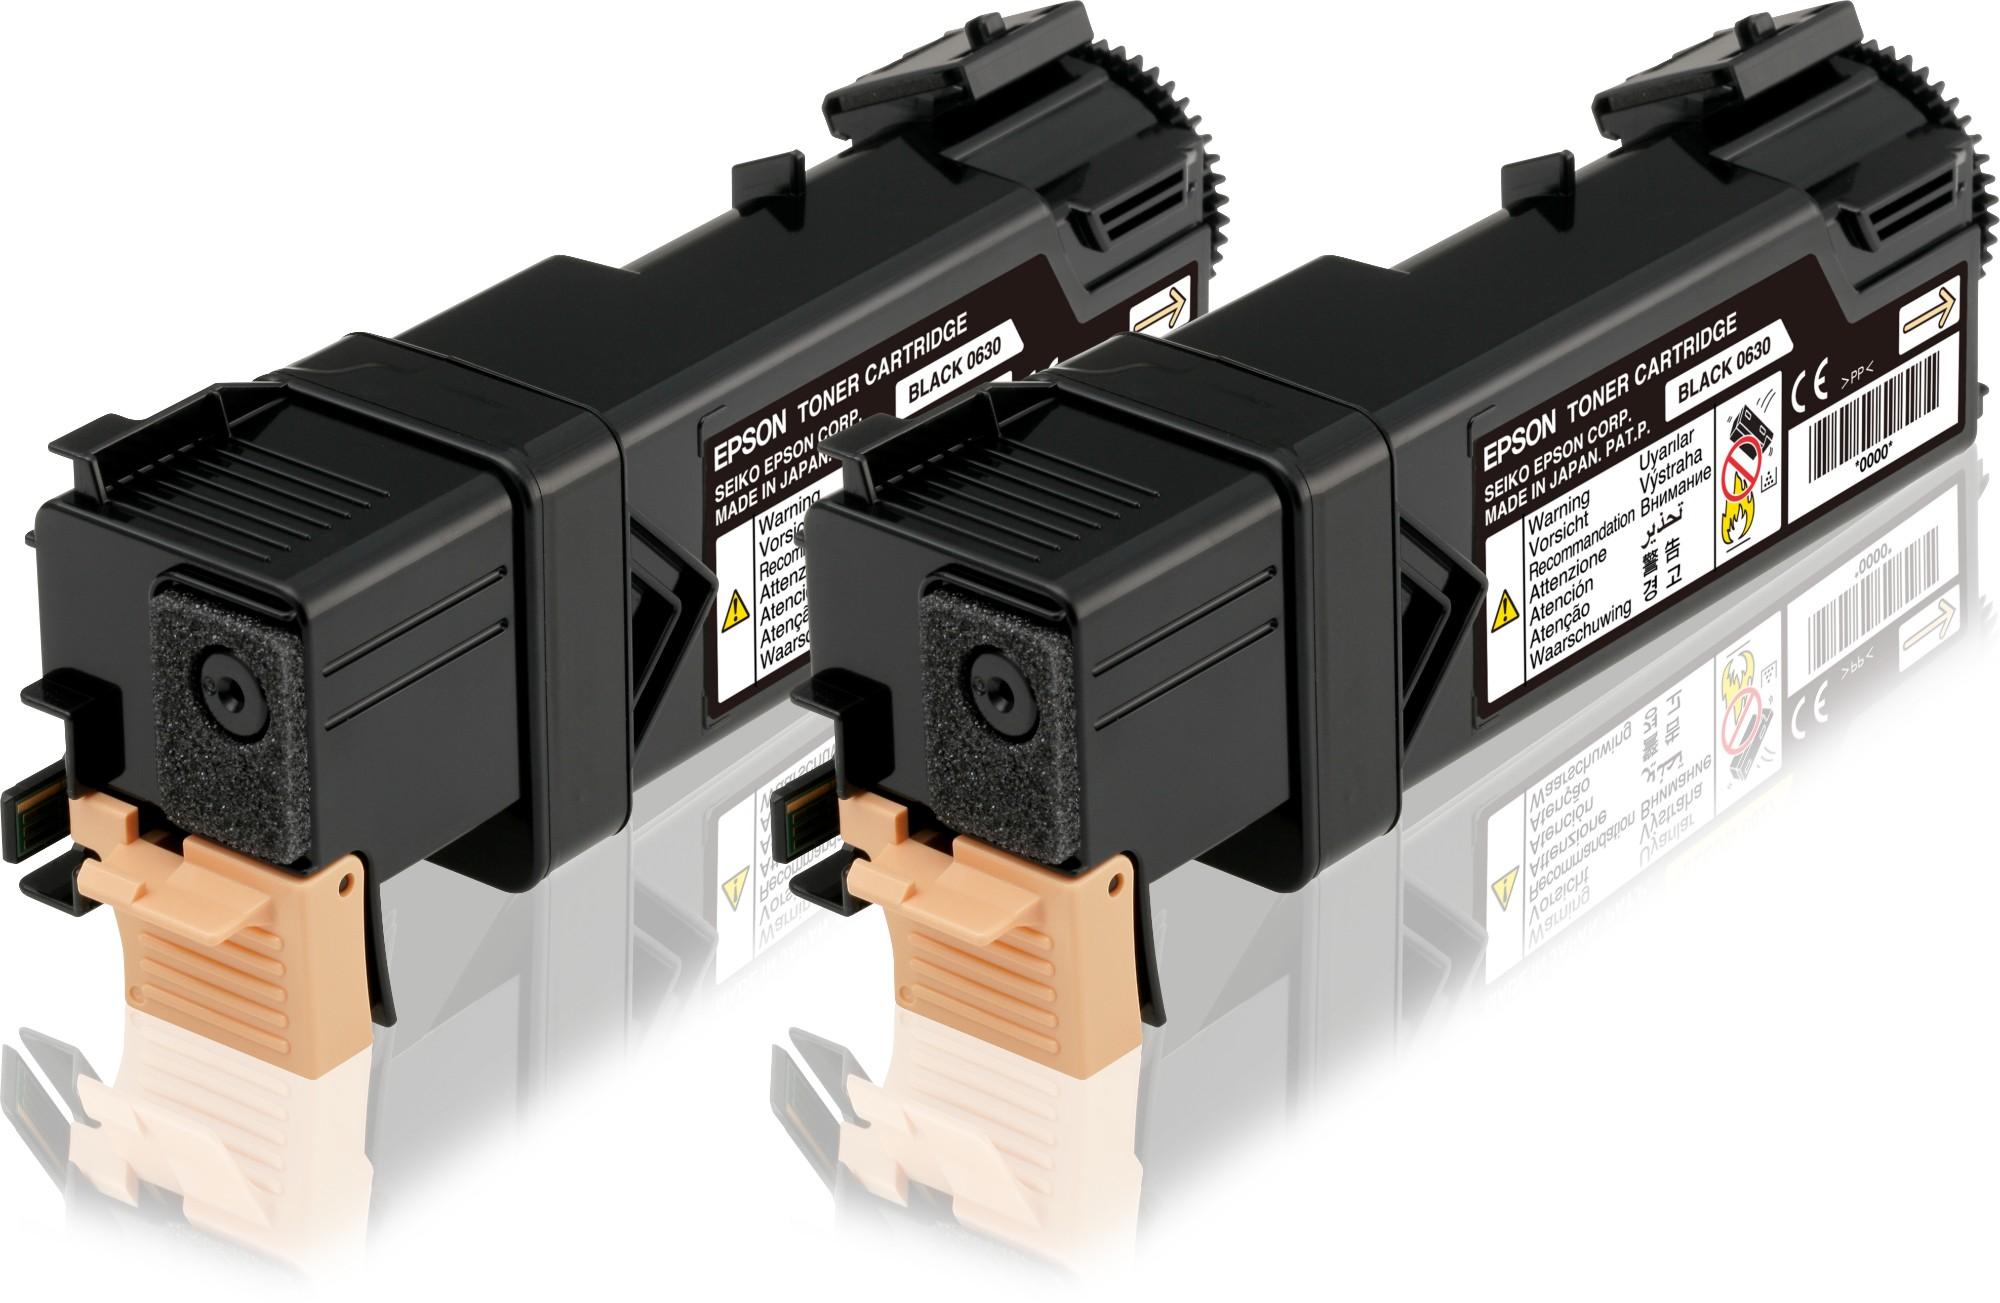 Epson Doble cartucho de tóner negro 3kx2